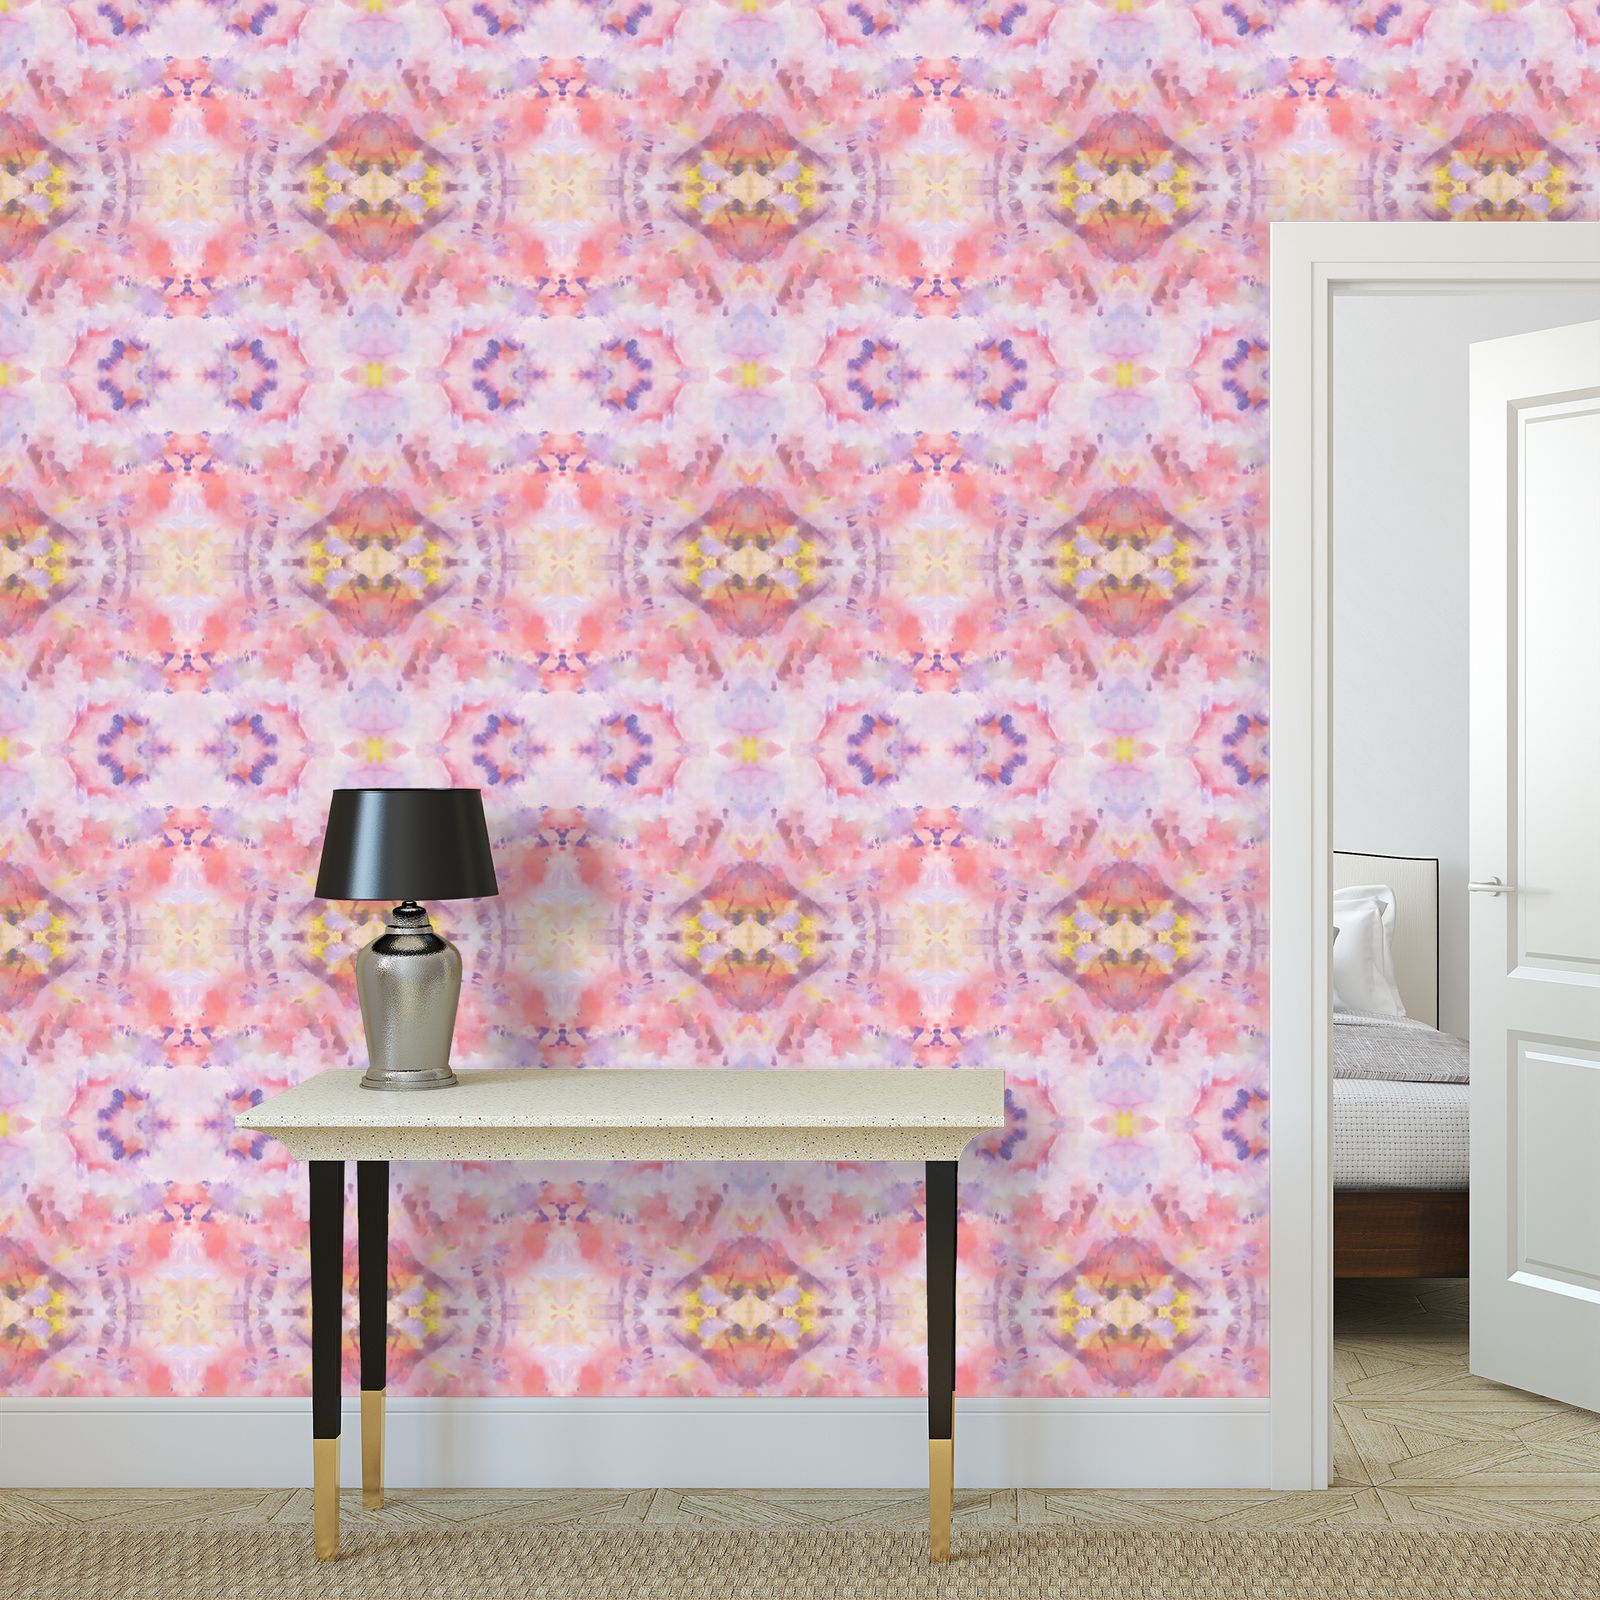 Wallpaper Rolls Painting 24